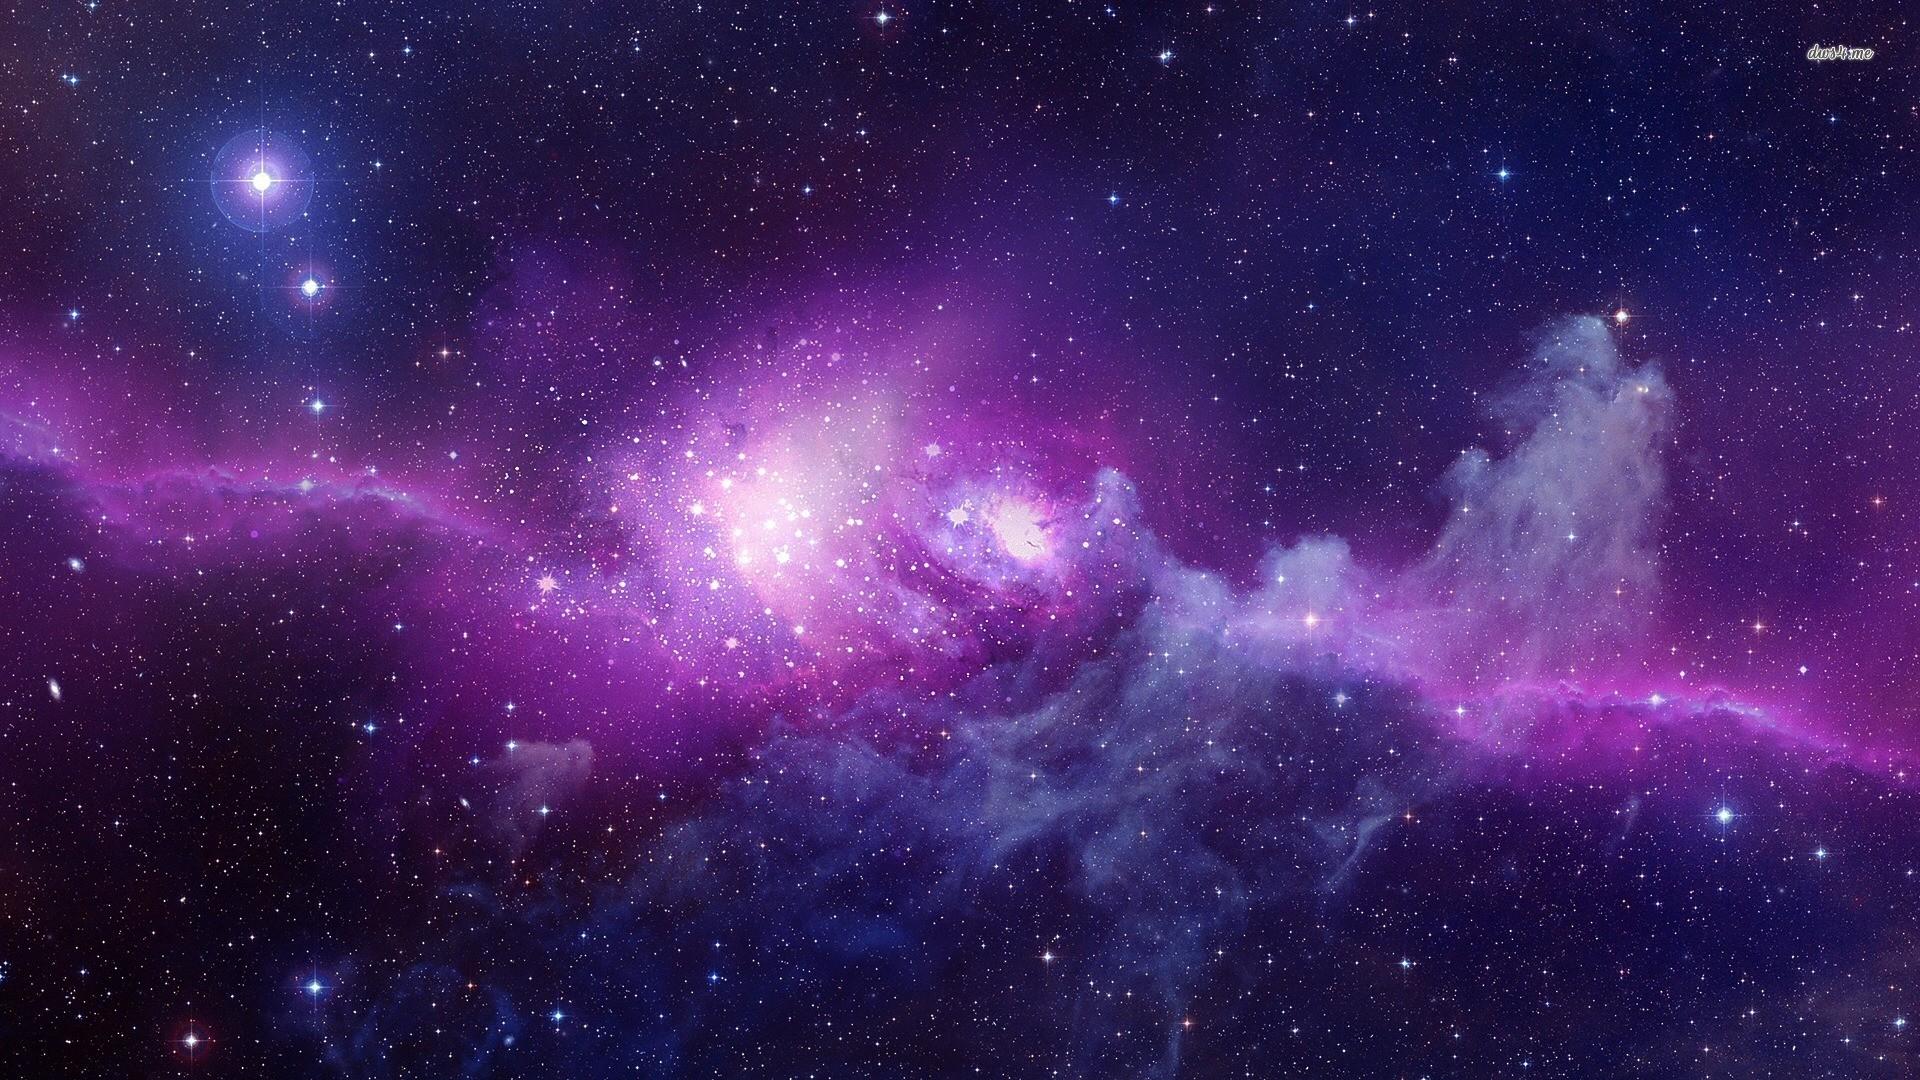 Space Stars Purple Background Wallpaper